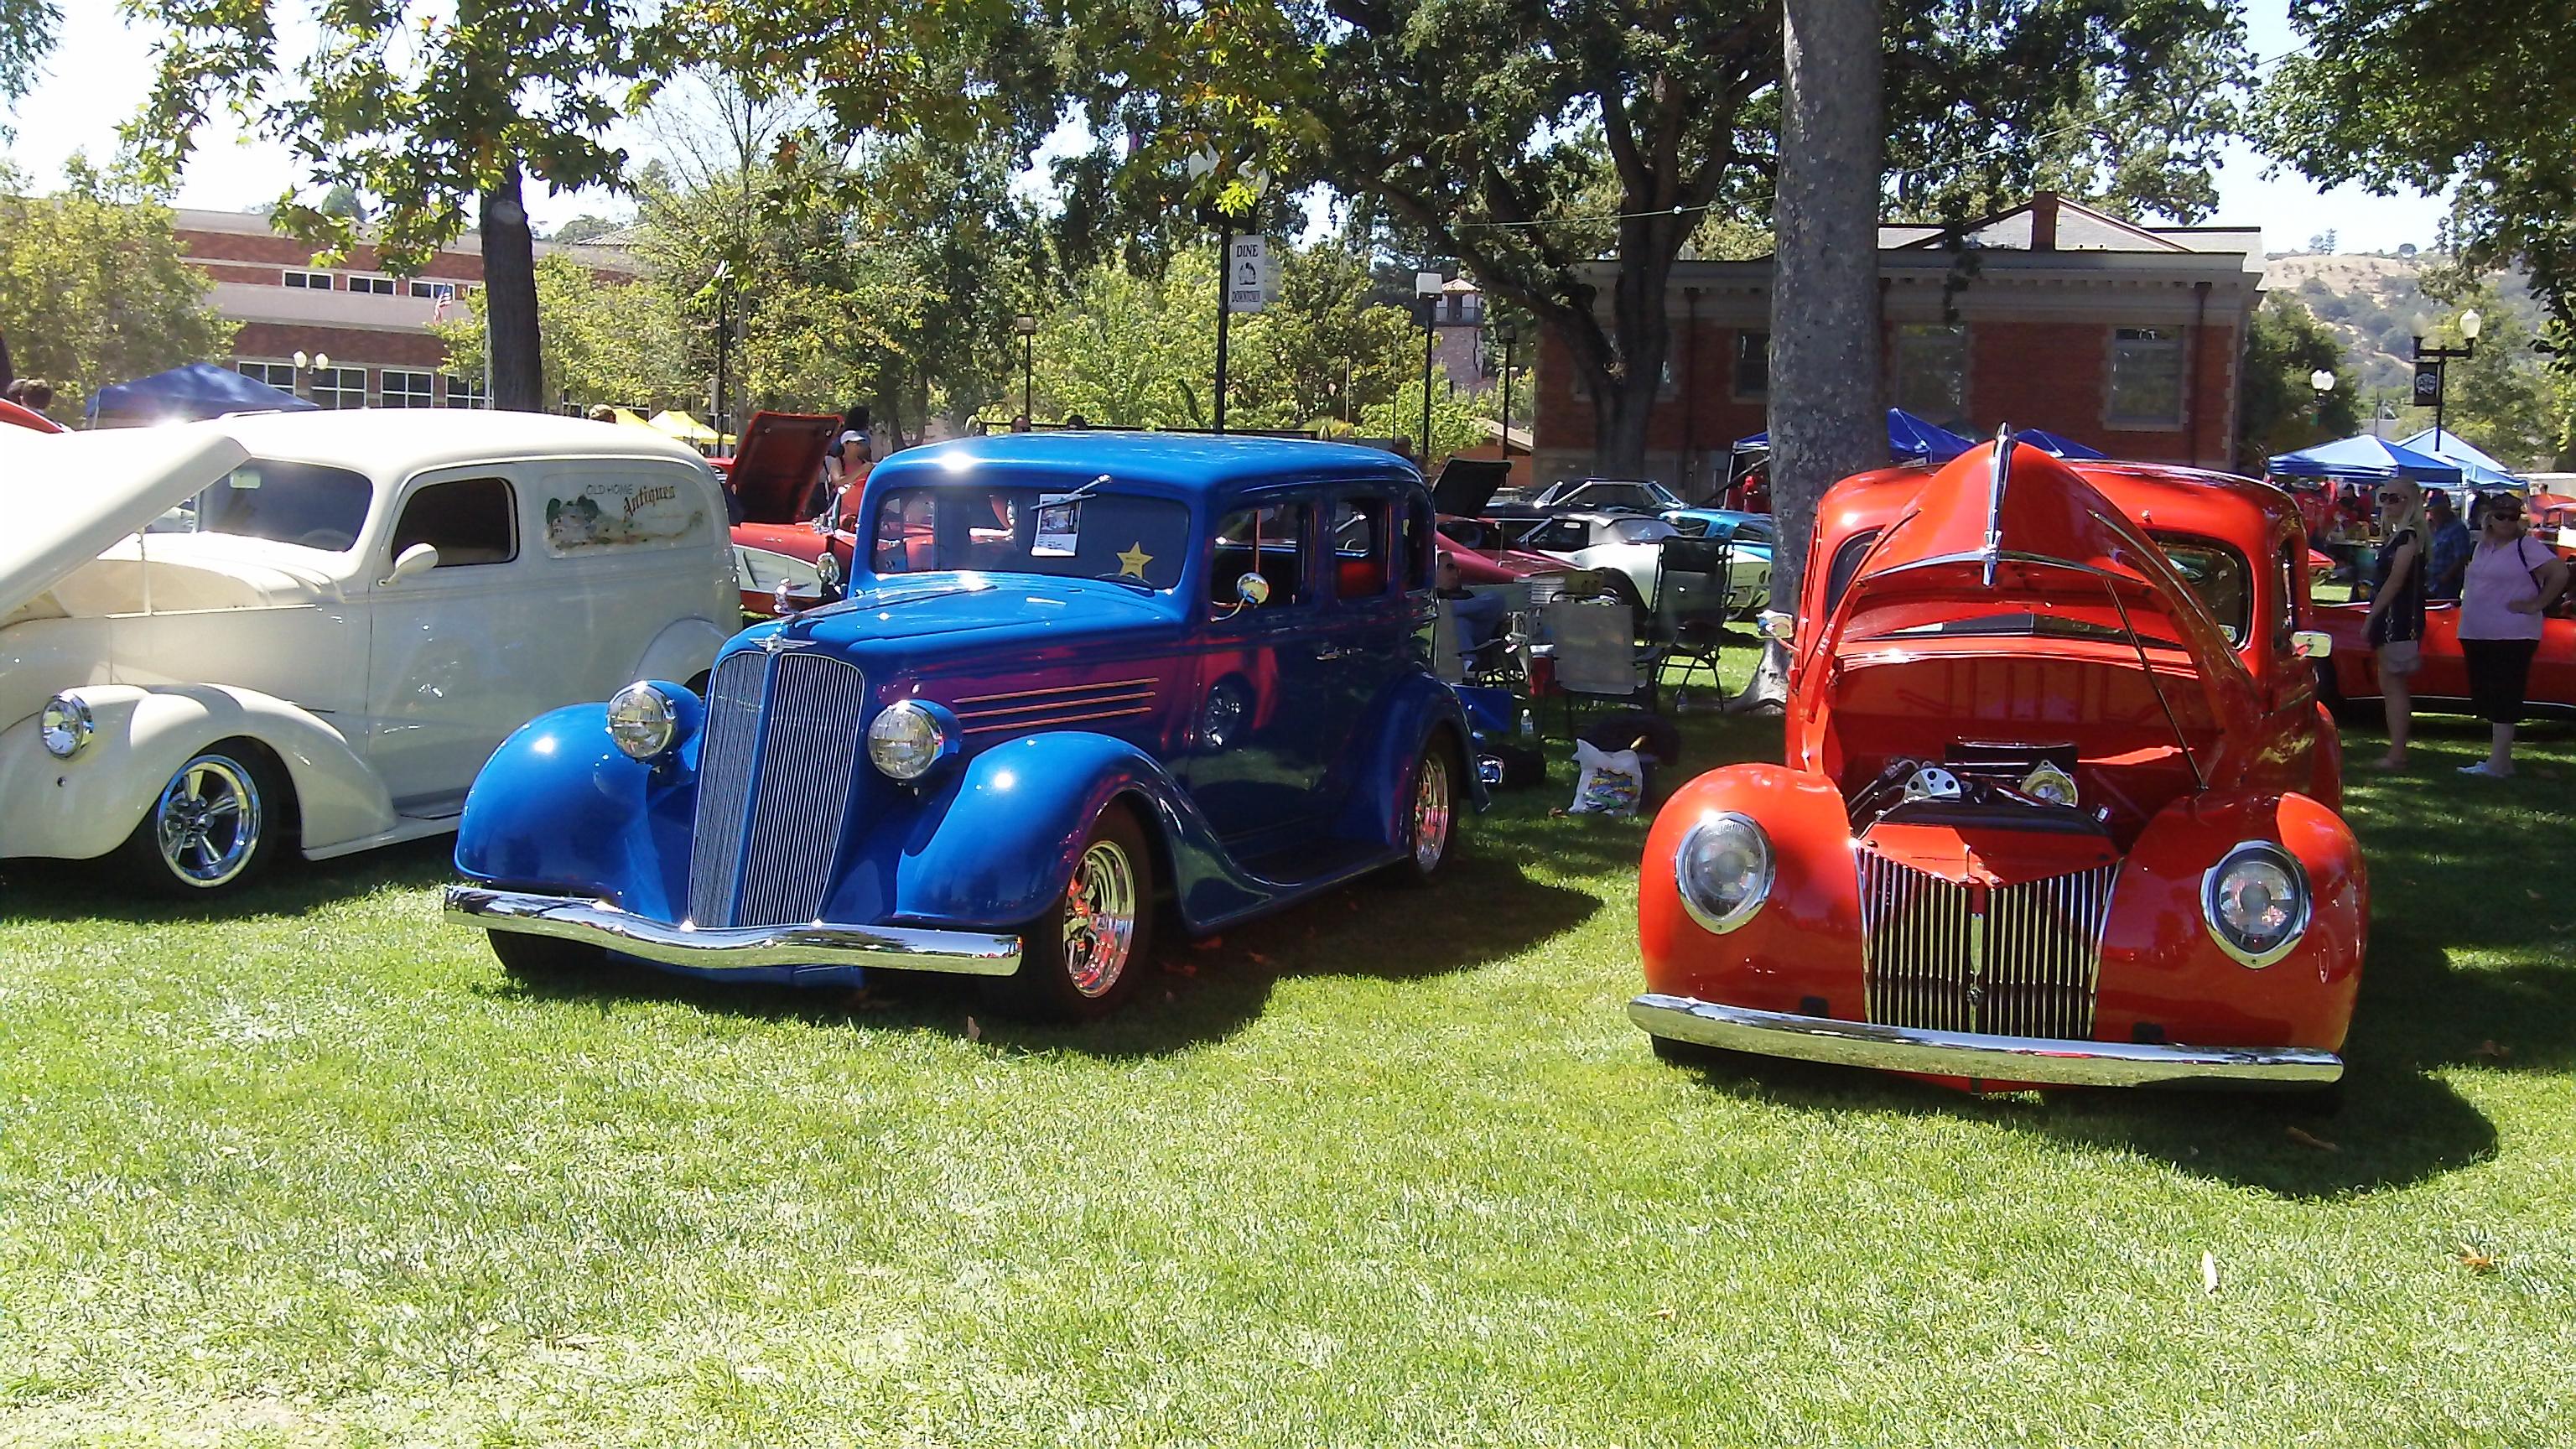 Paso Robles Car Show Jo Whipp Pricketts Blog - Paso robles car show